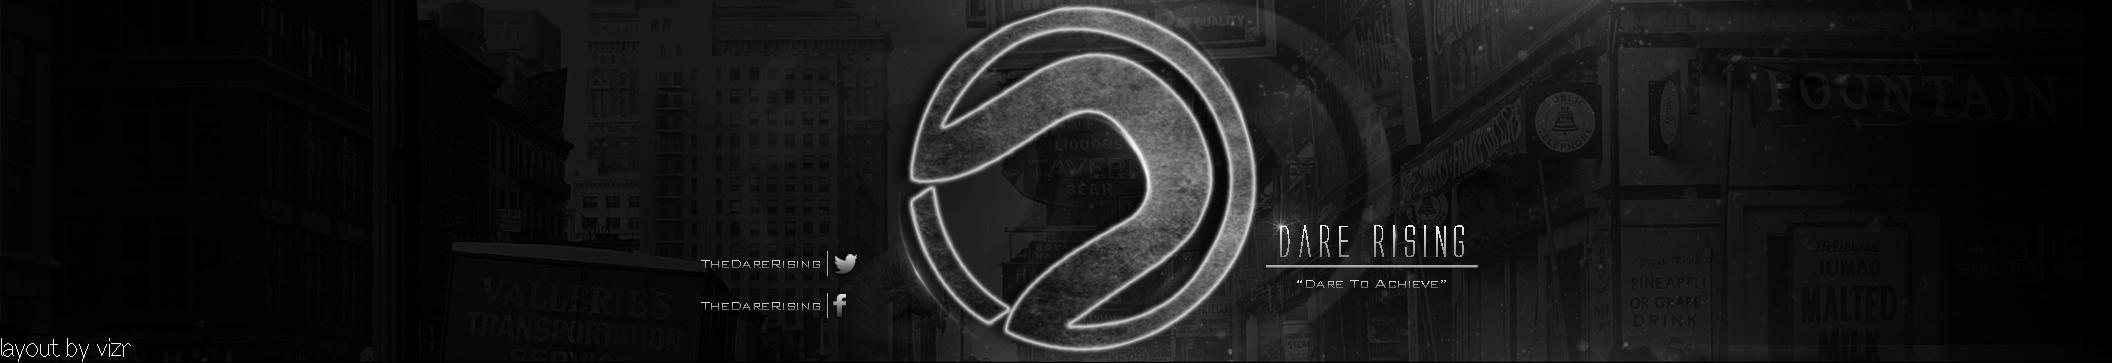 Darerising Logo  3min creations  darerisingDarerising Logo